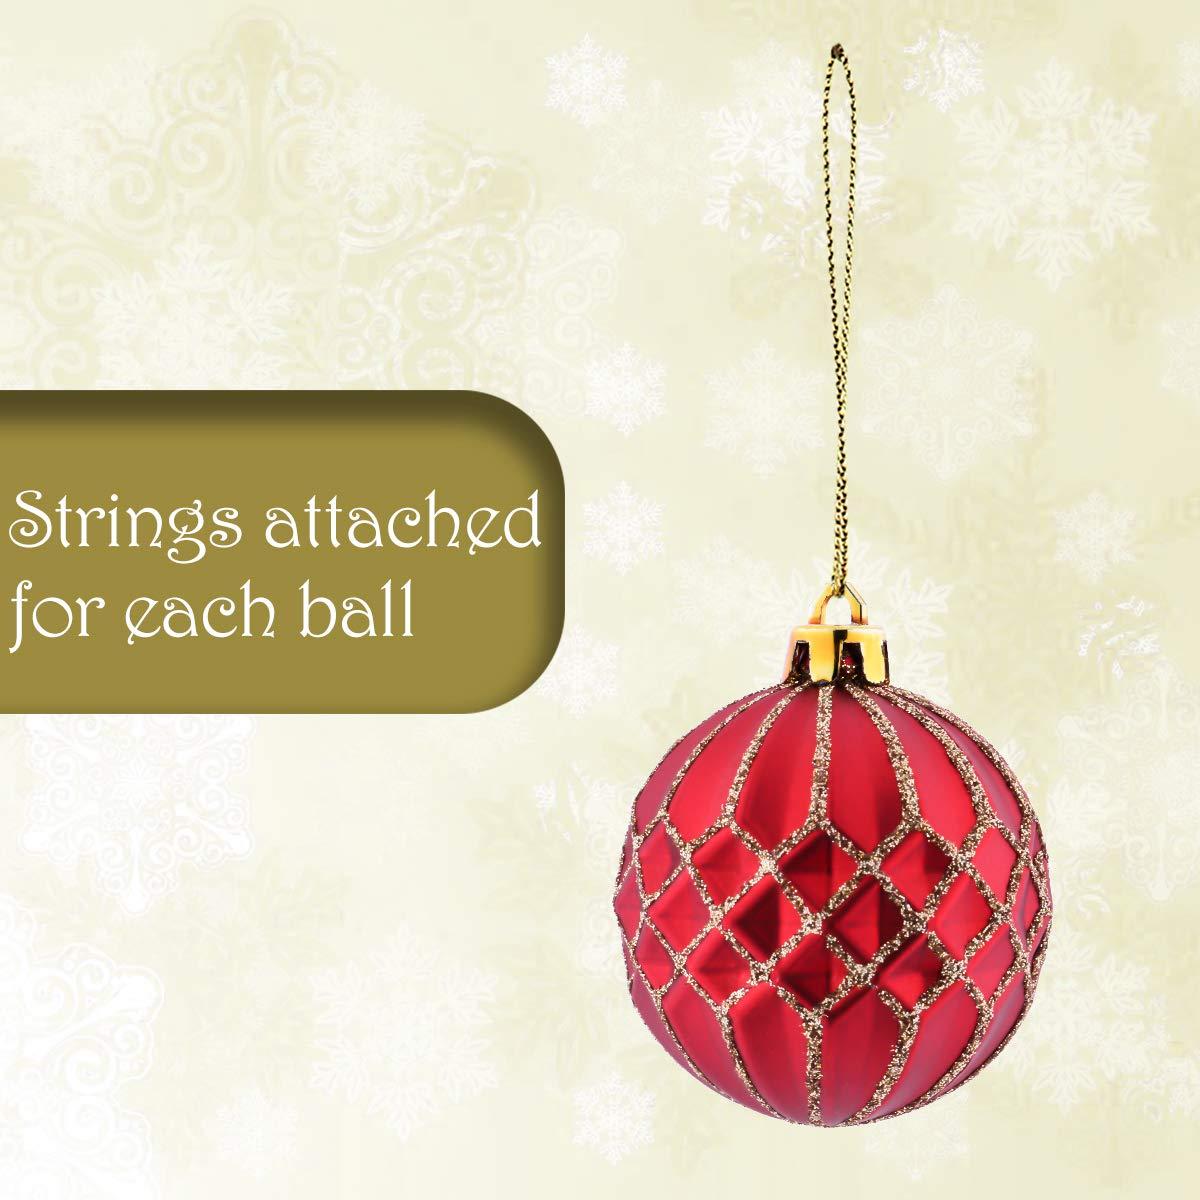 Amazon.com: V&M VALERY MADELYN 30ct Shatterproof Christmas Ball ...